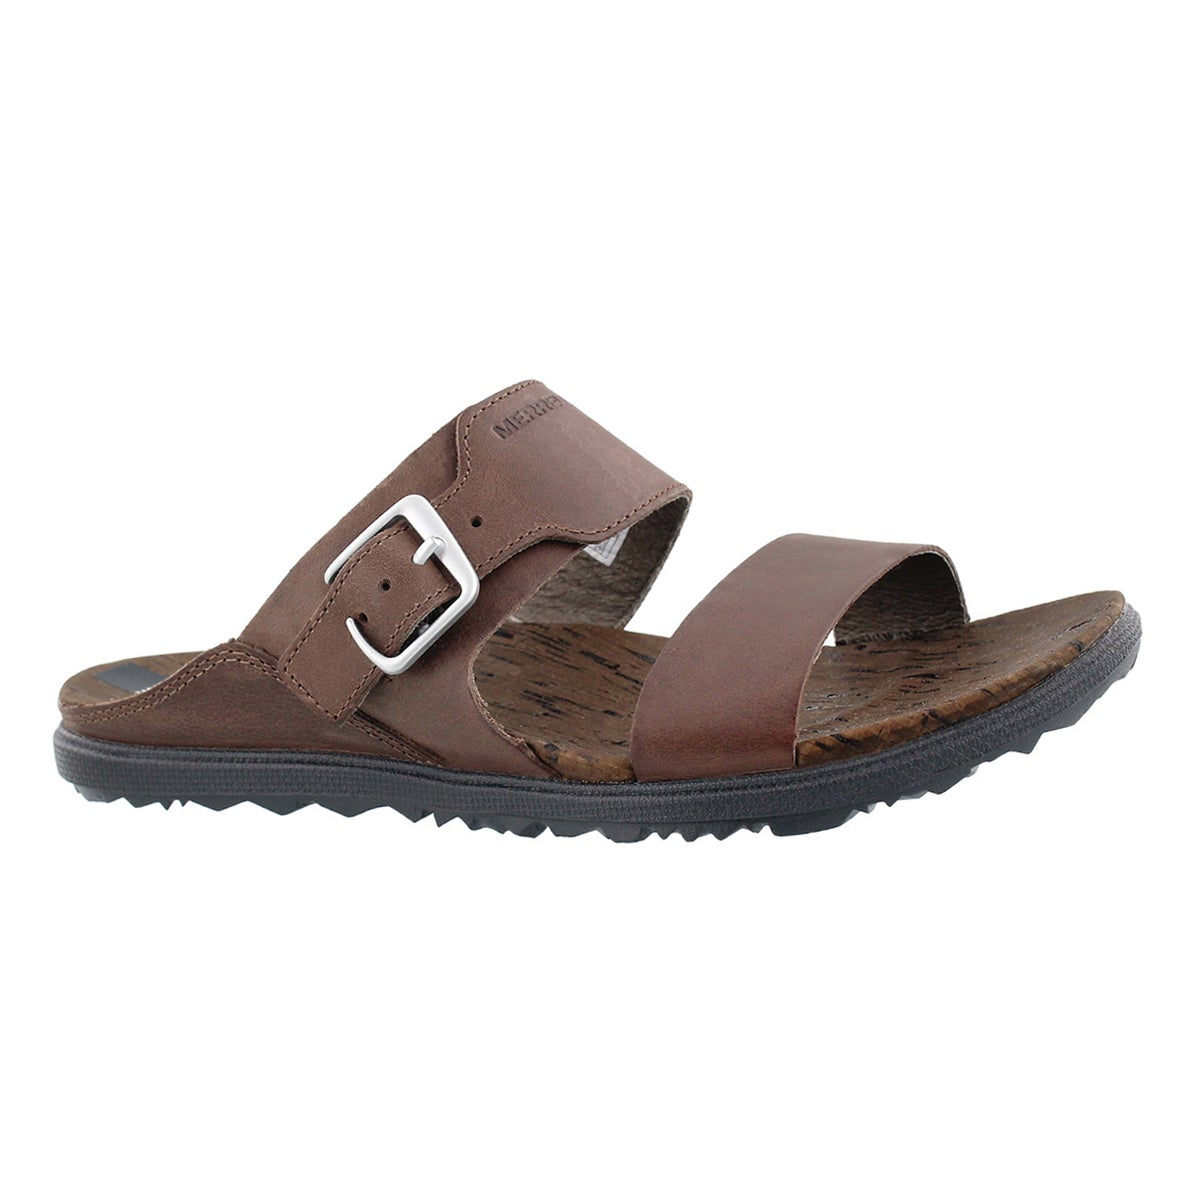 Women's AROUND TOWN BUCKLE brn buckle slide sandal